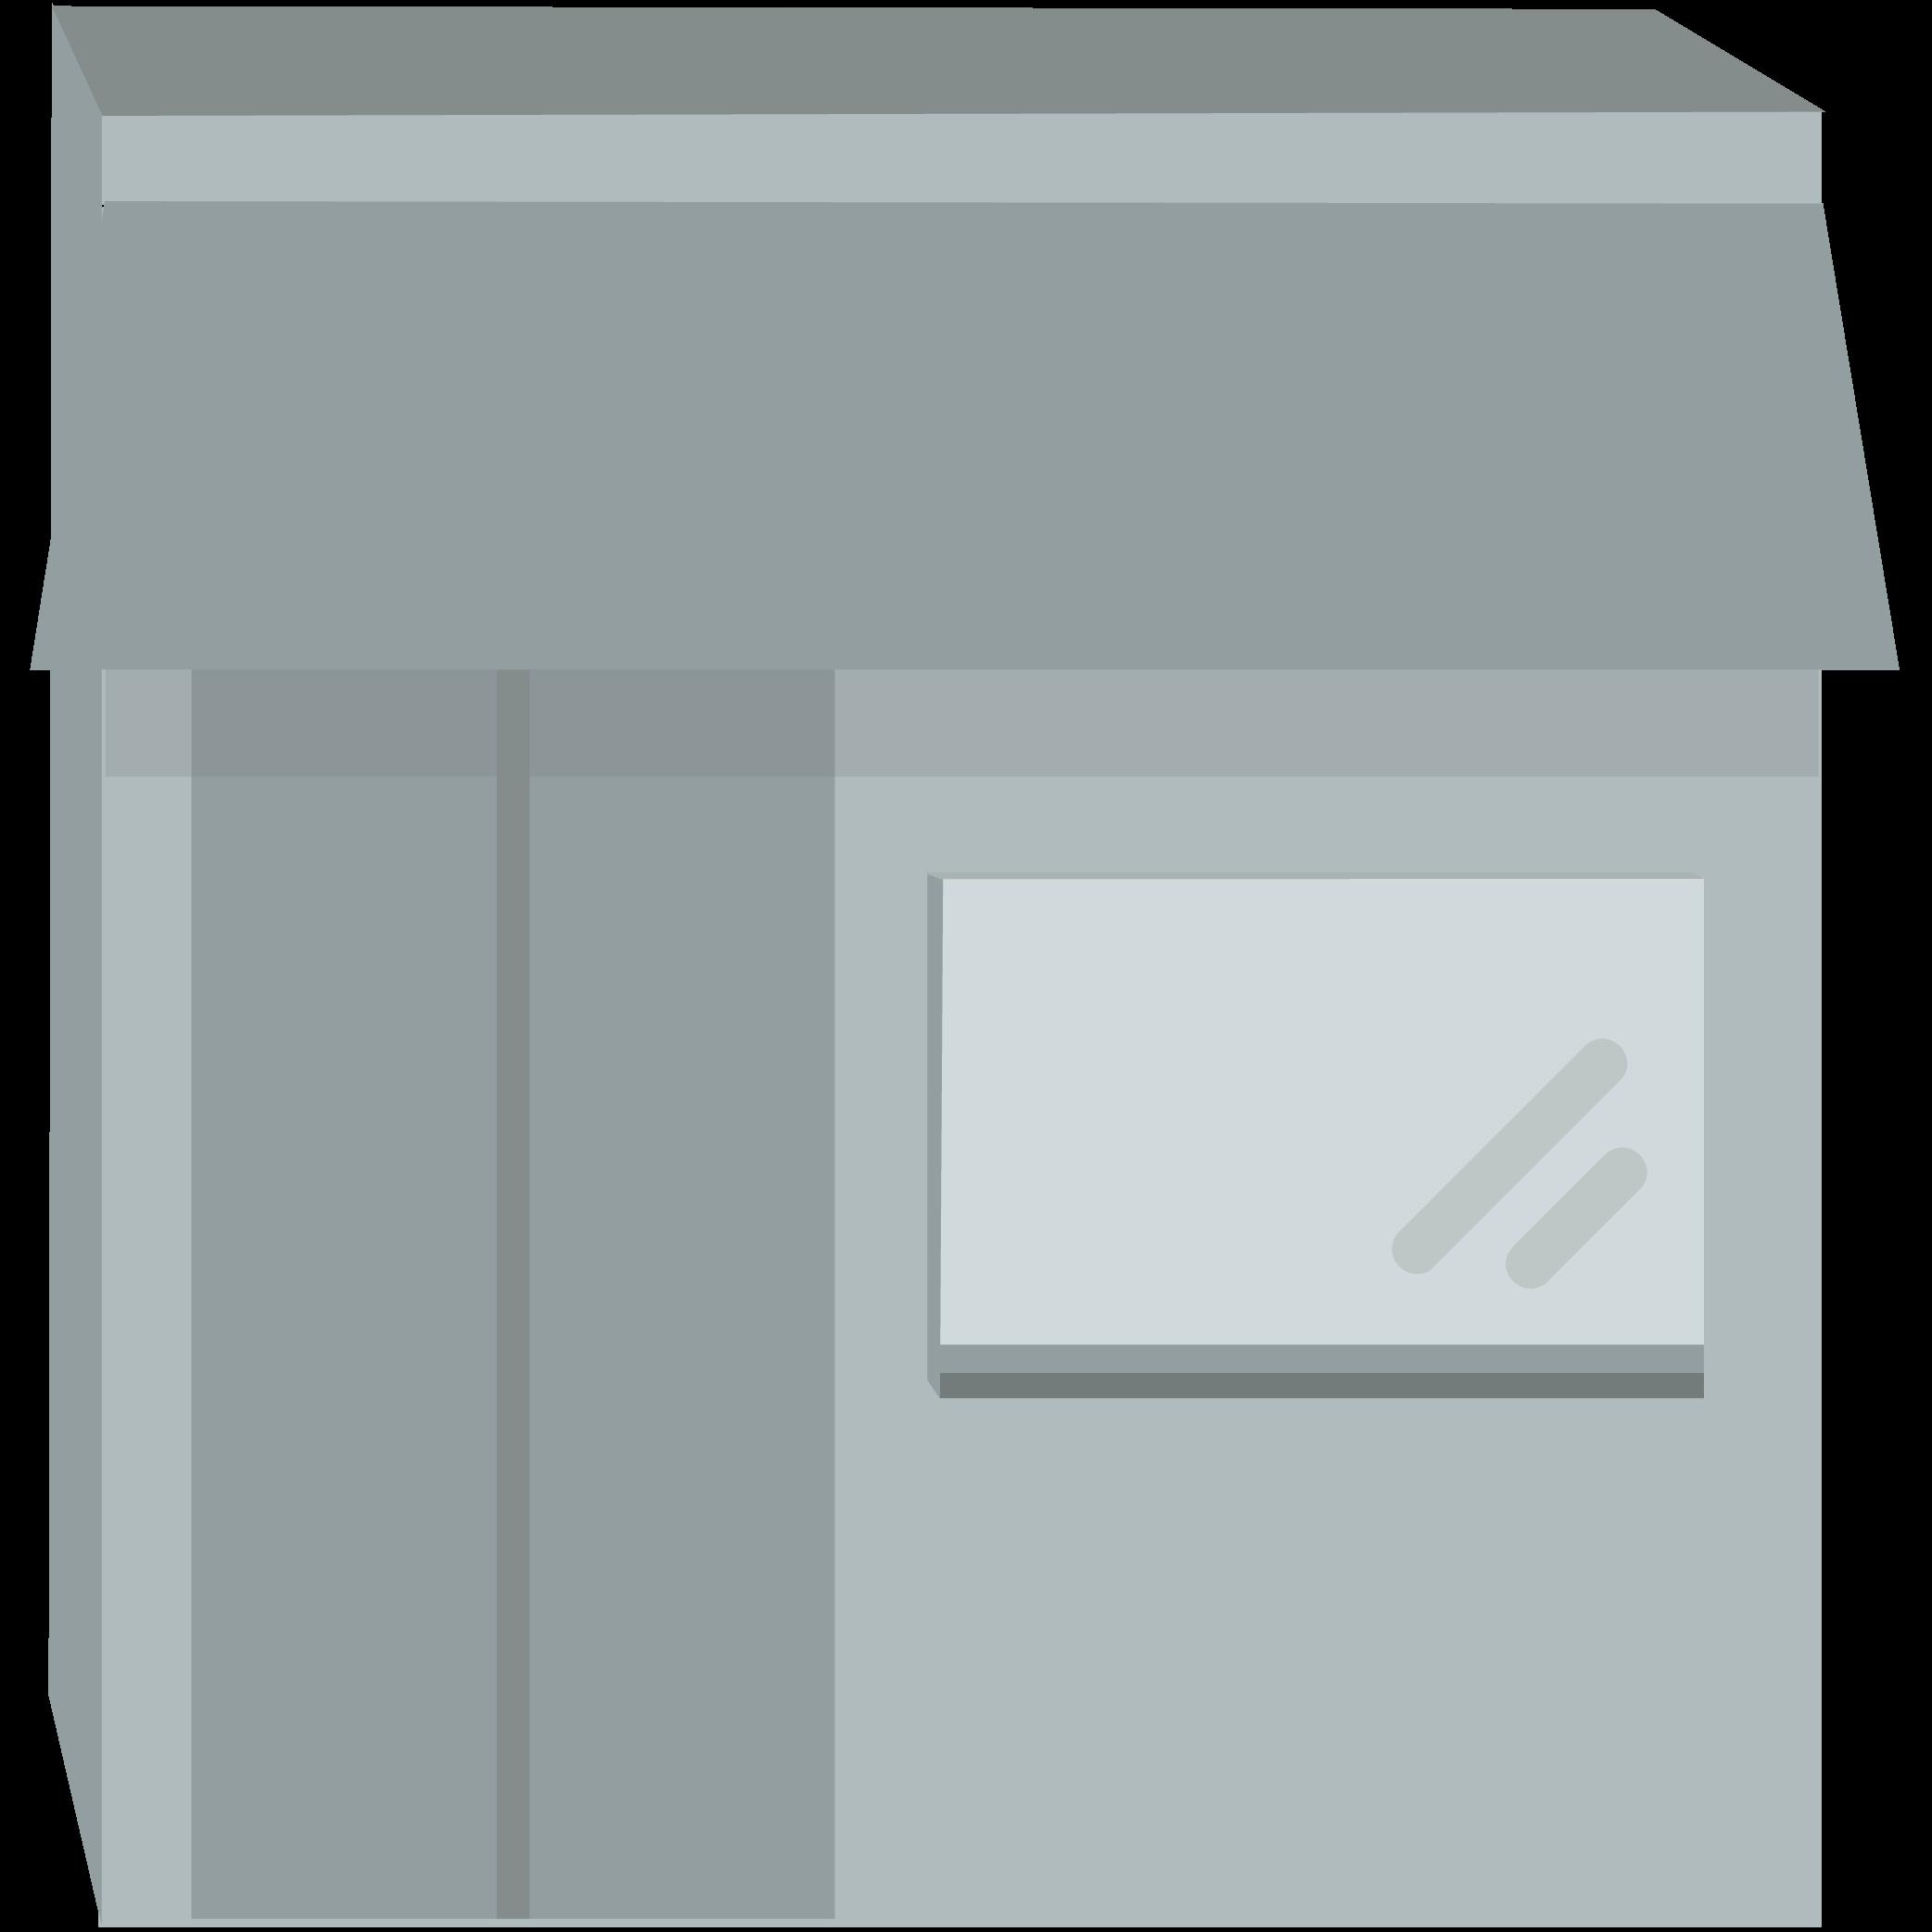 Retailer store CPG